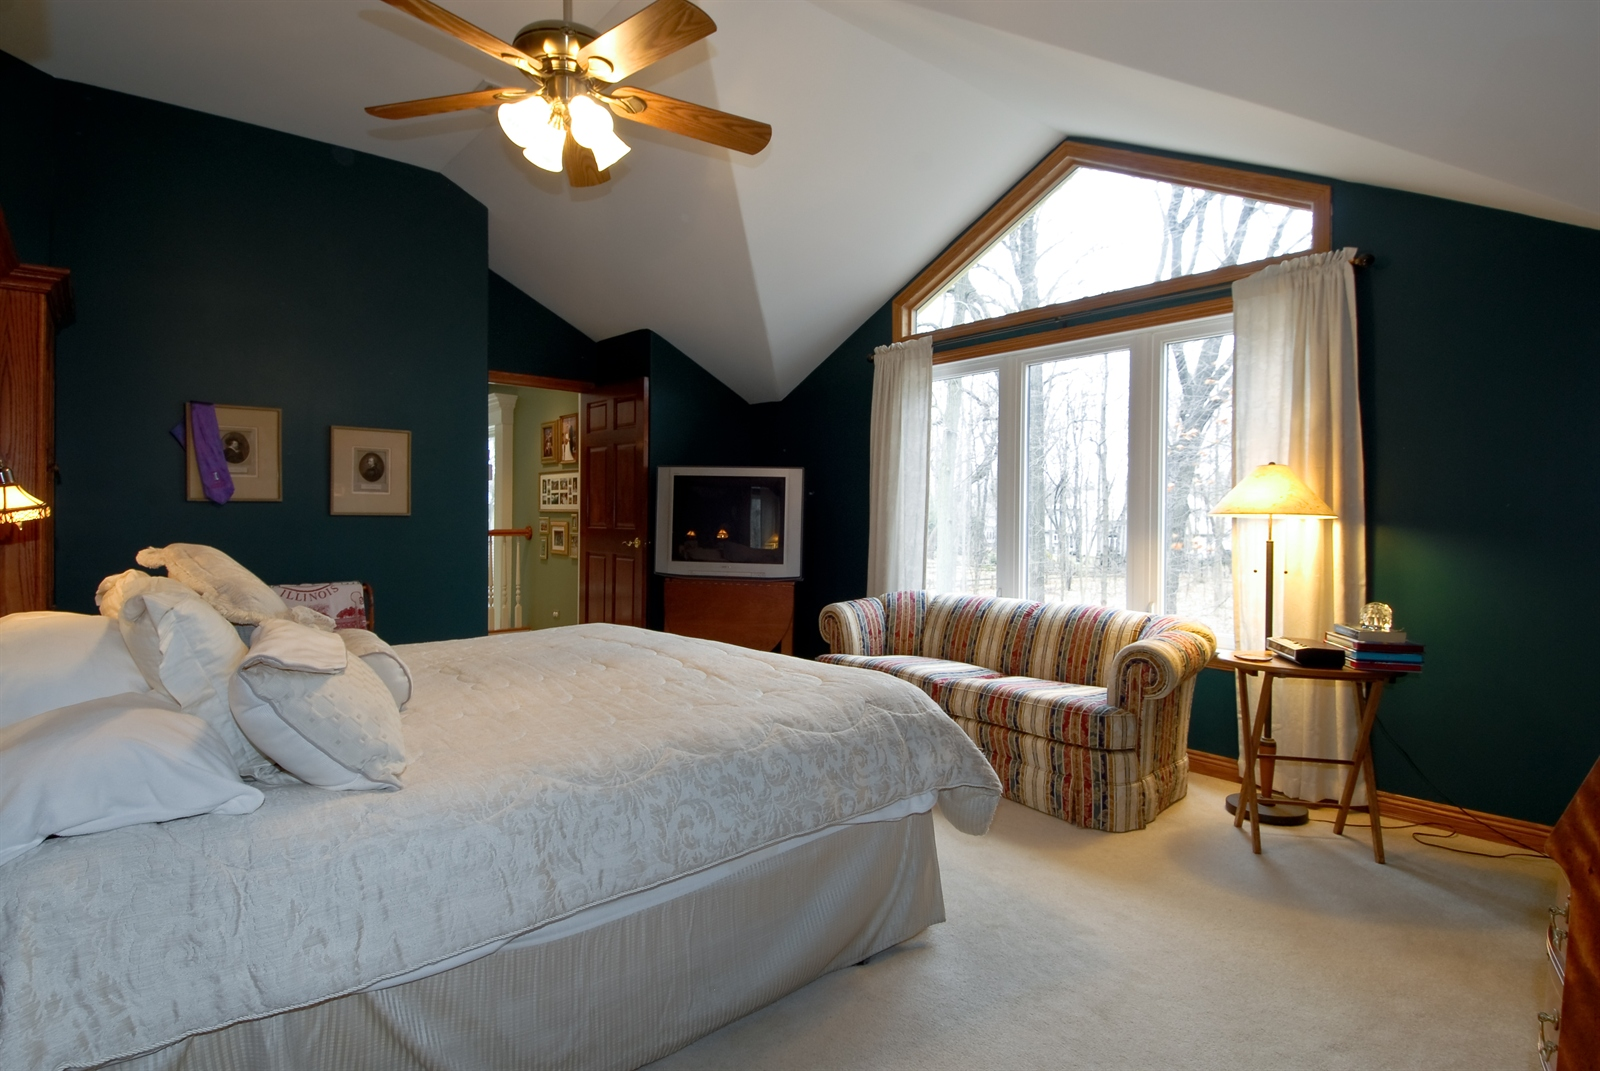 Real Estate Photography - 620 E Gartner Rd, Naperville, IL, 60540 - Master Bedroom